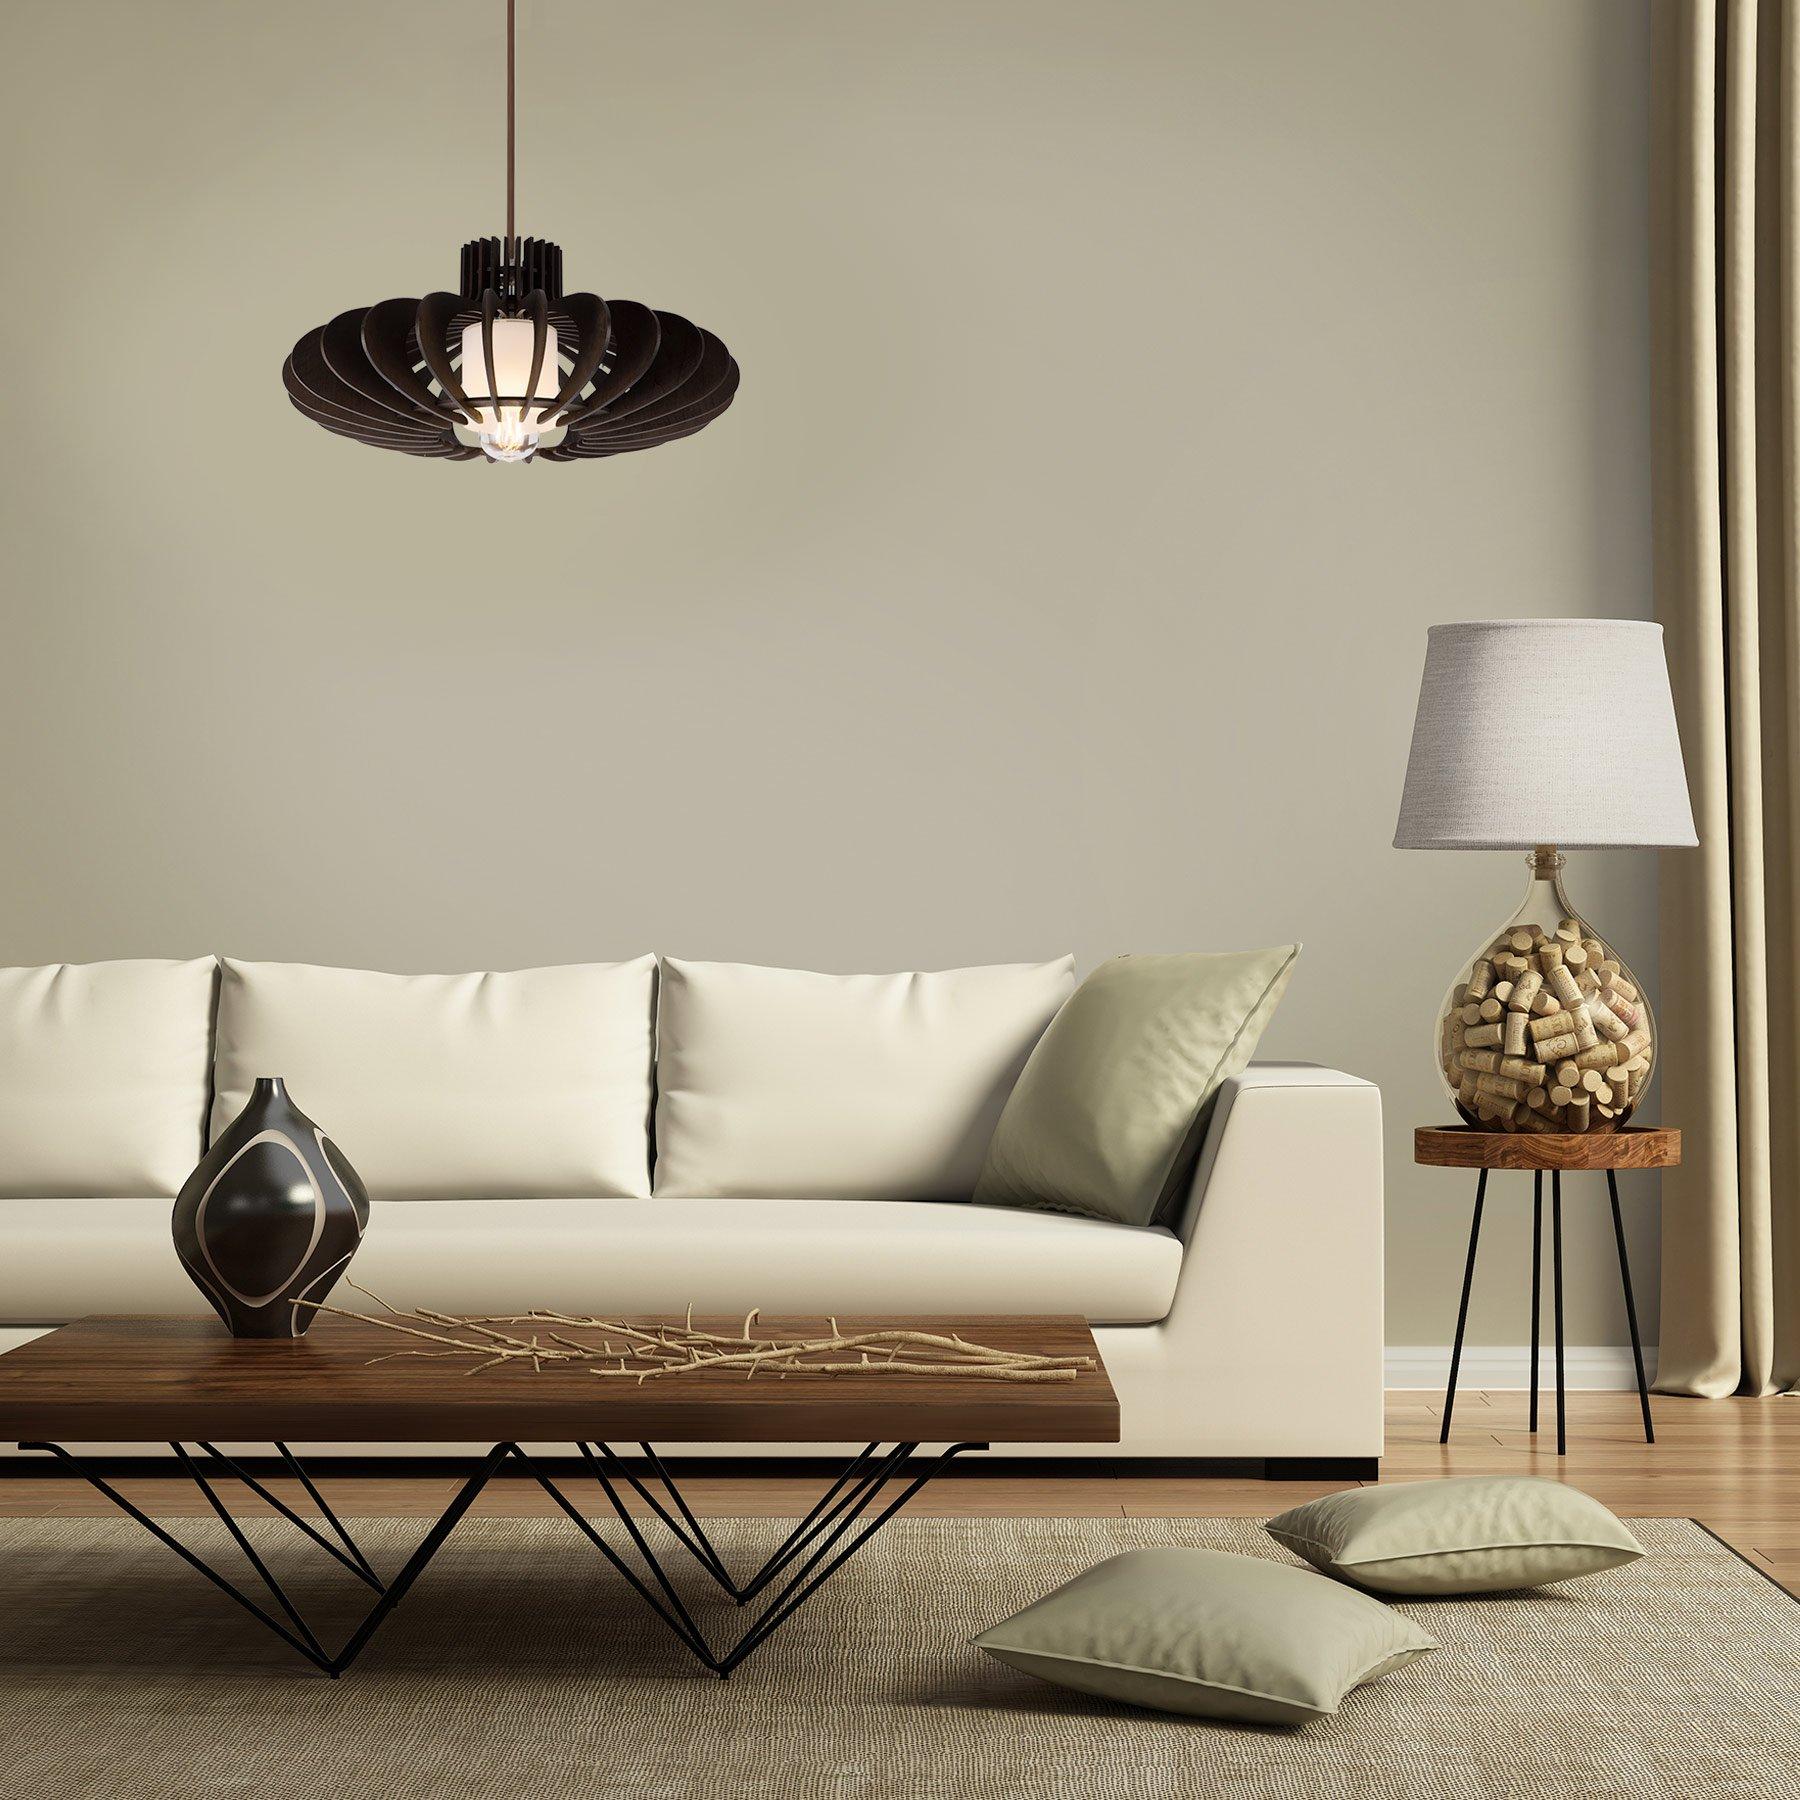 MAYKKE Oban Medium Wooden Pendant Lamp   Lantern Style with Dark Brown Rings, Hanging Light with Adjustable Cord   Walnut Wood Finish, MDB1040201 by Maykke (Image #7)